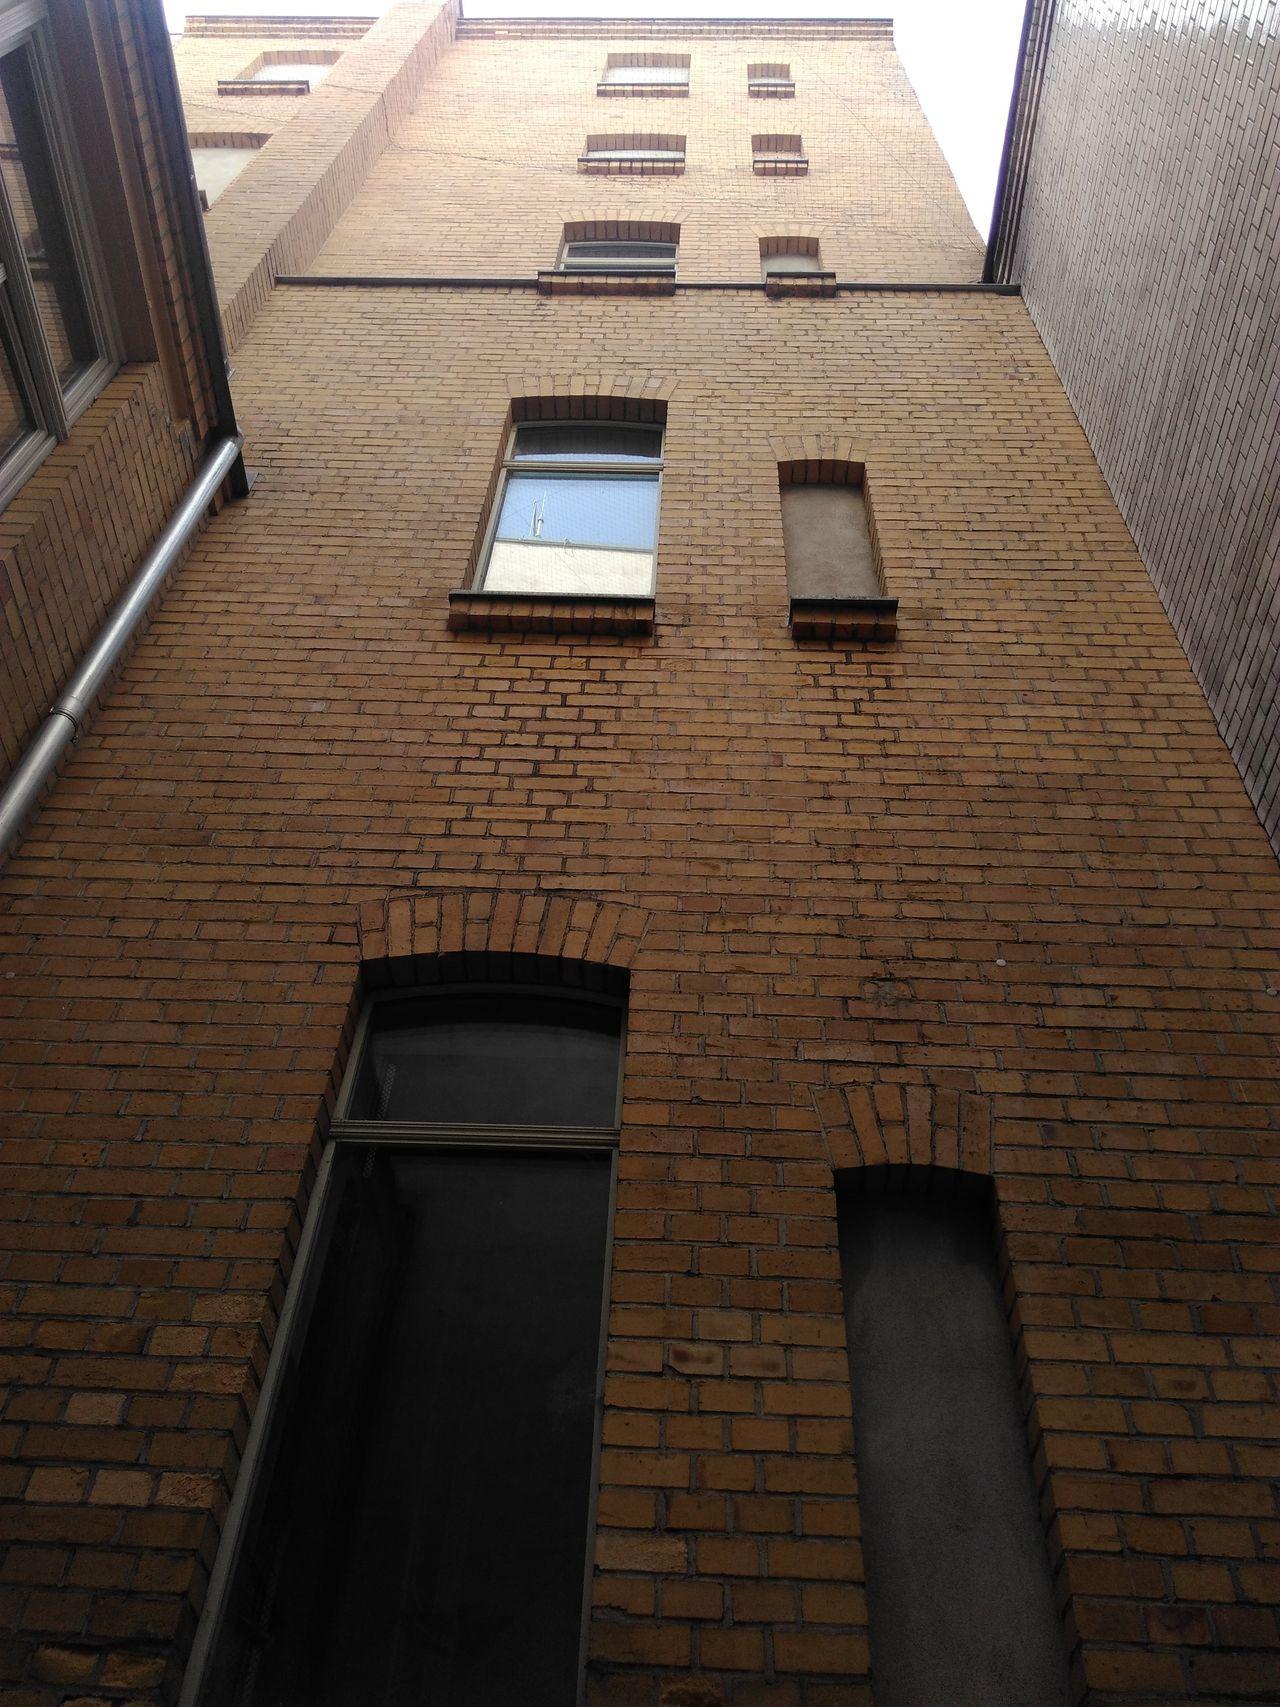 Brick Ziegel Wand Wall Haus Haus Fenster Windows Architecture Built Structure Brick Wall Low Angle View Leipzig Germany Deutschland Window City Life Innenhof